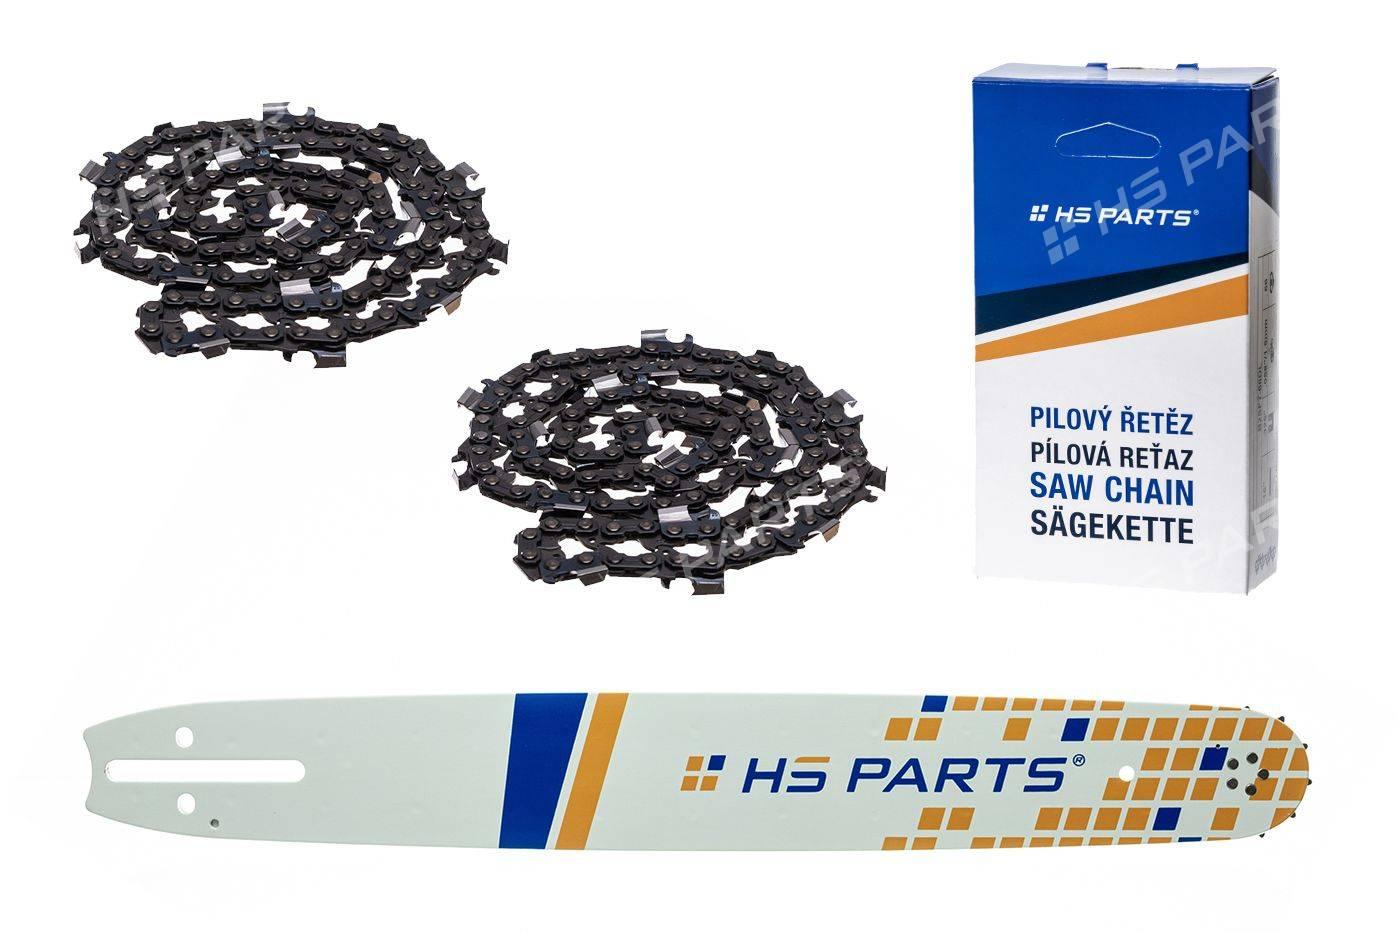 "HS PARTS Prowadnica 20"" (50cm) + 2 x Łańcuch .3/8"" 1,5 mm 72 ogniw dla Husqvarna"